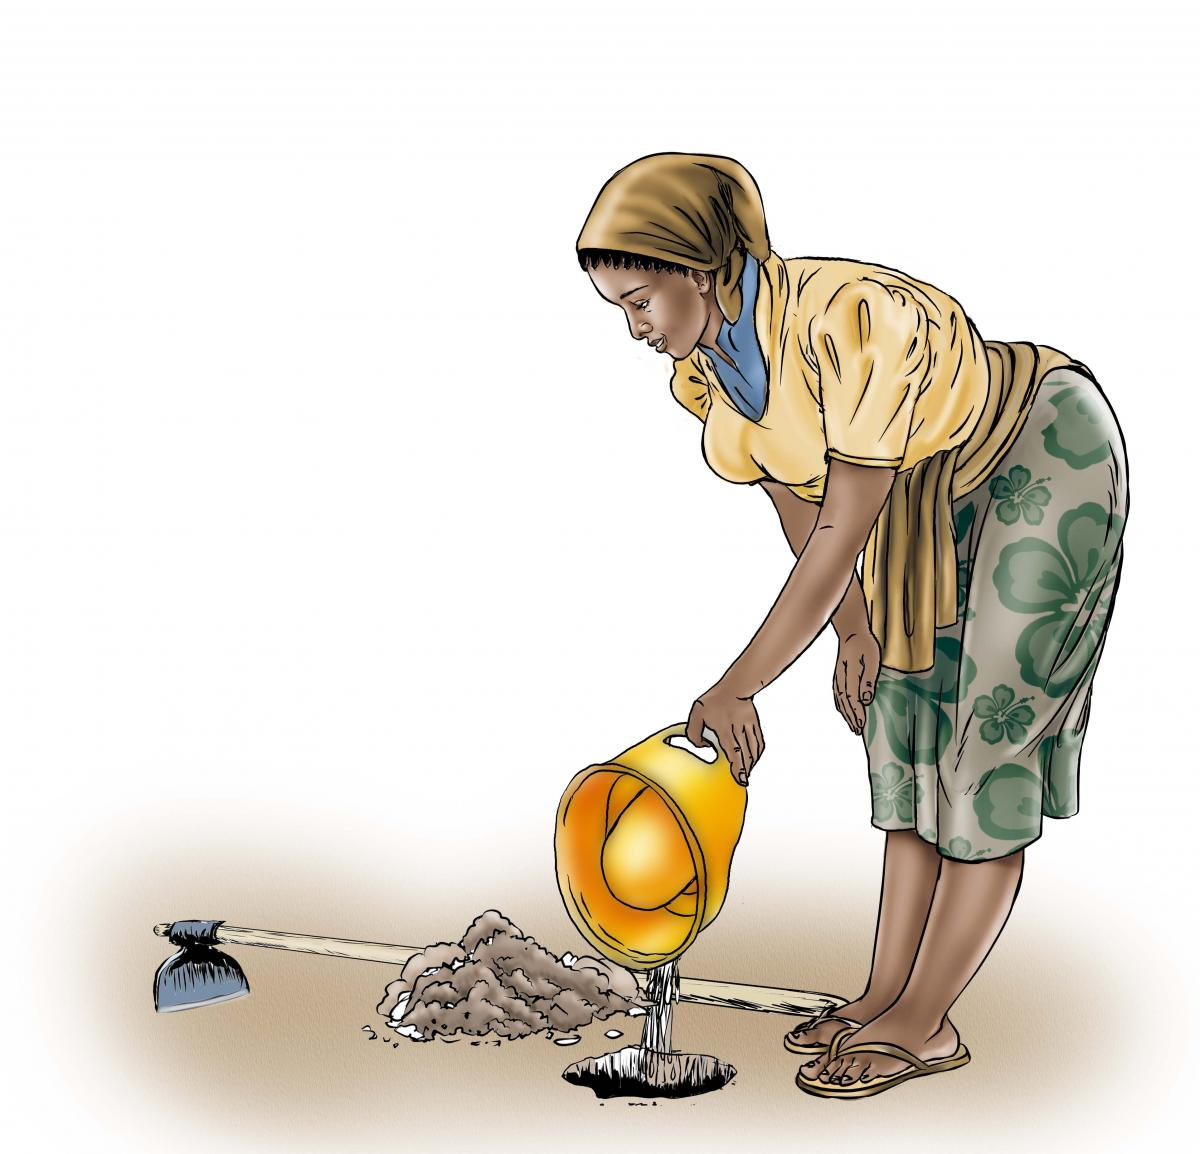 Sanitation - Depositing waste in hole - 03B - Sierra Leone